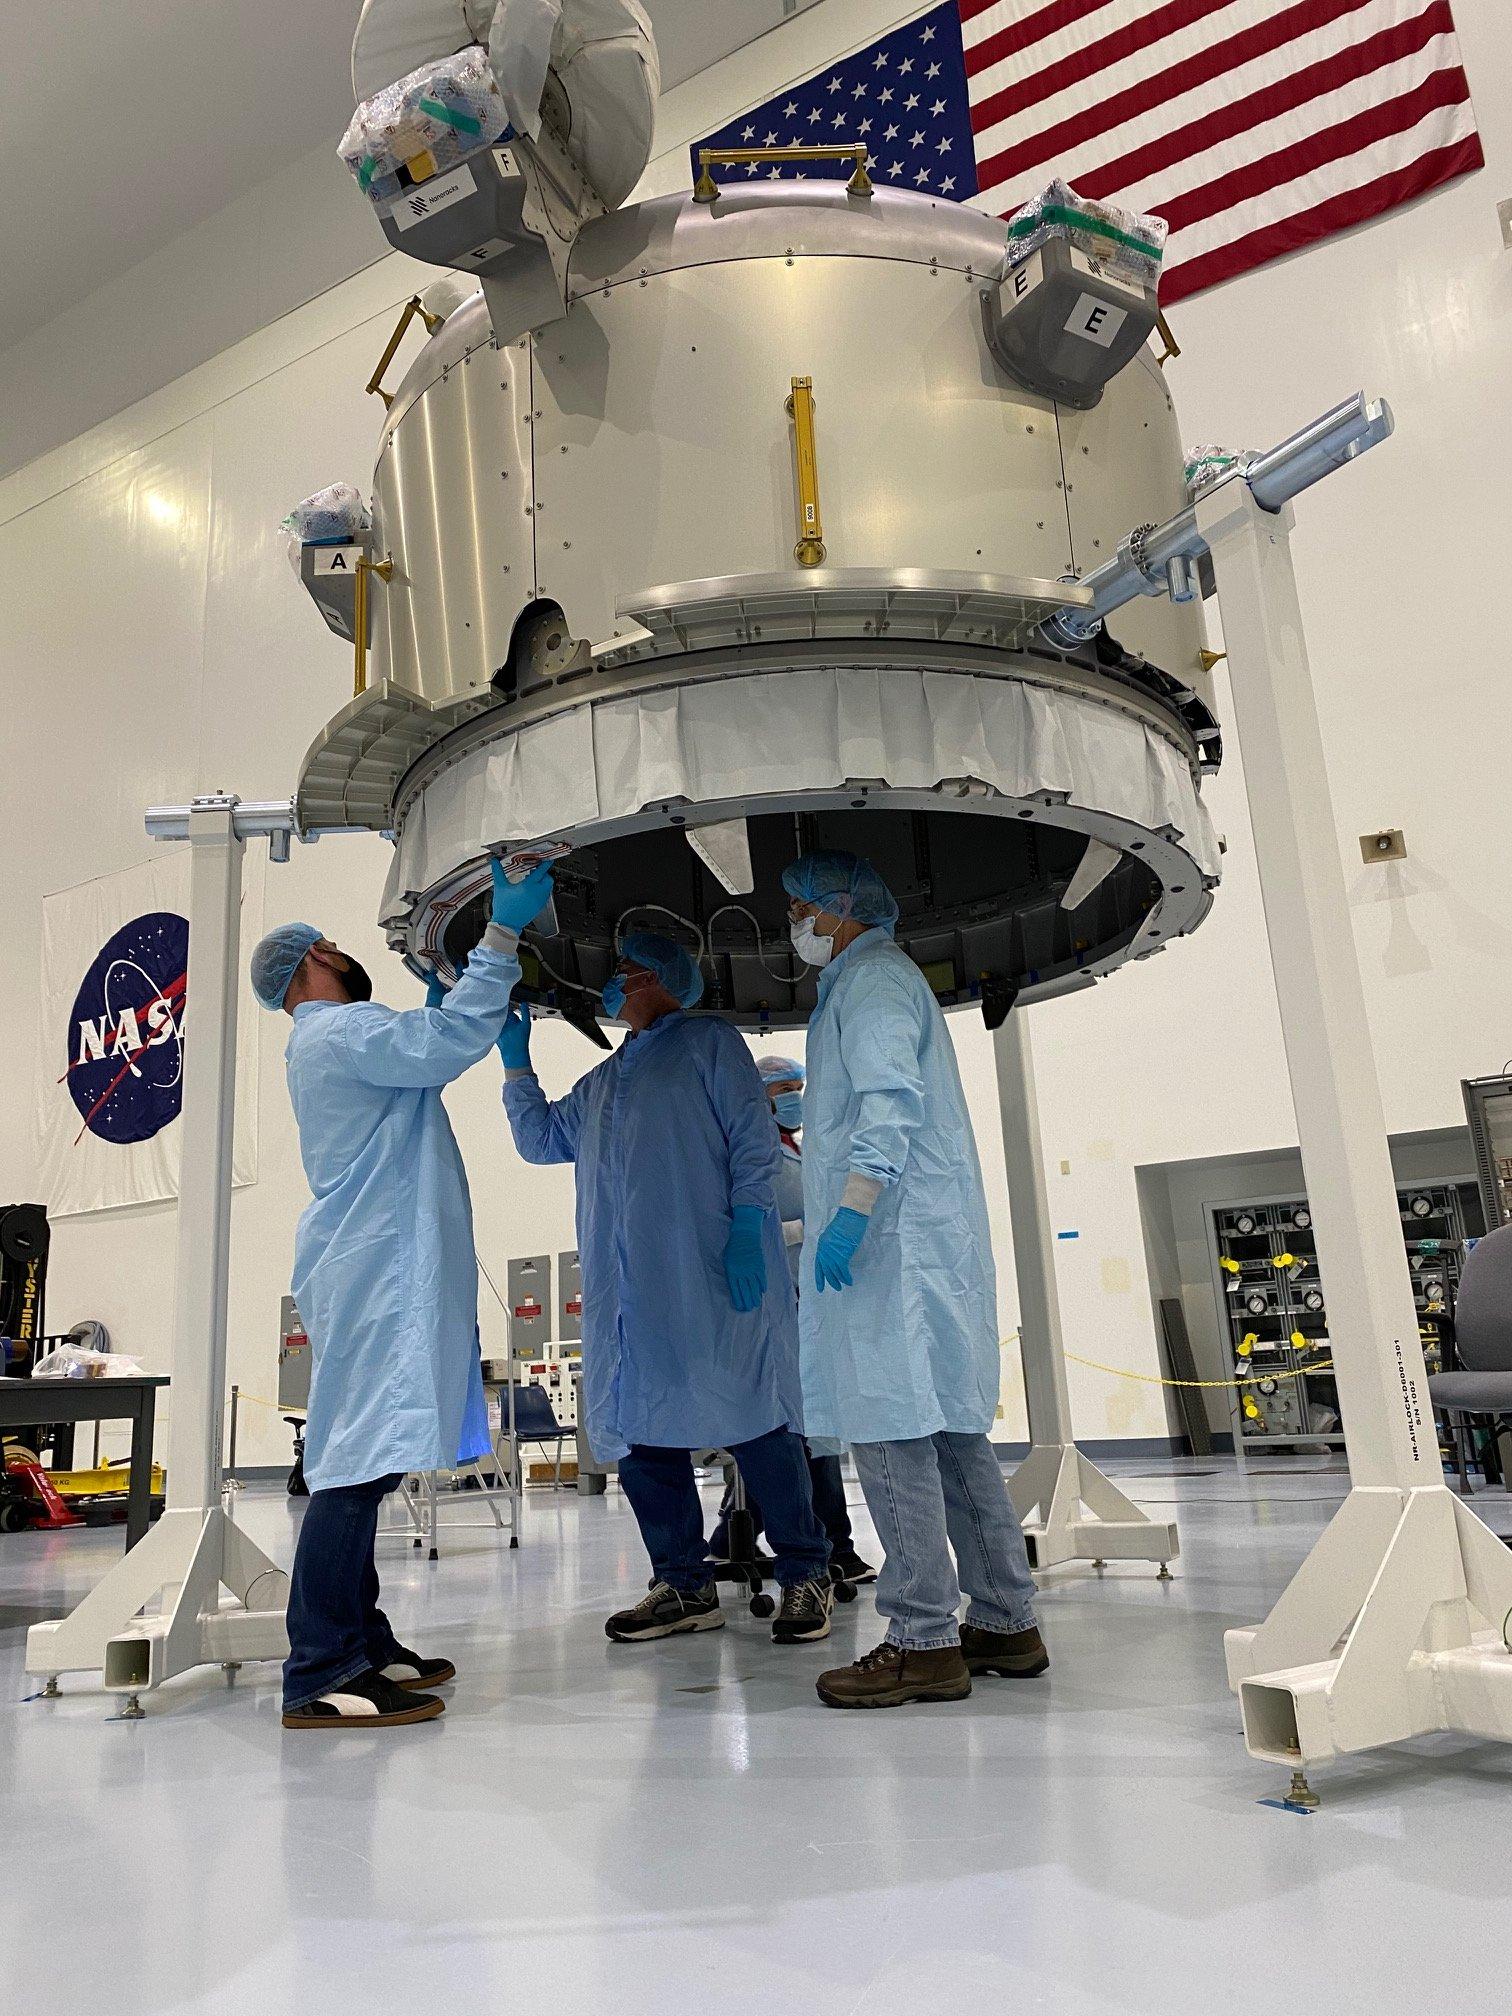 Nanoracks : installation du sas commercial Bishop sur l'ISS 11502